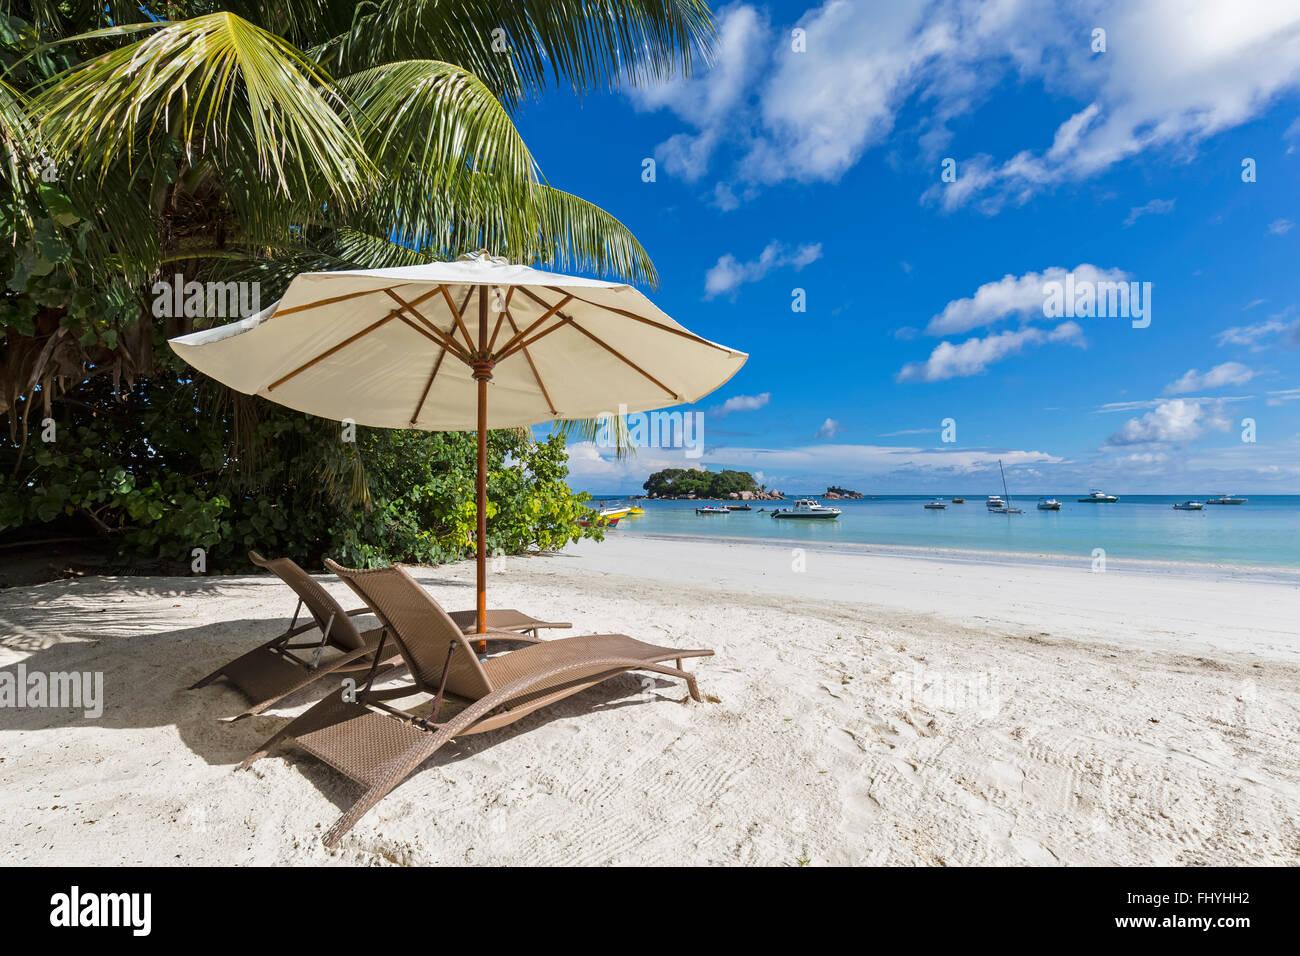 Seychelles, Praslin, Anse Volbert, Chauve Souris Island and Saint Pierre, beach with sun loungers Stock Photo